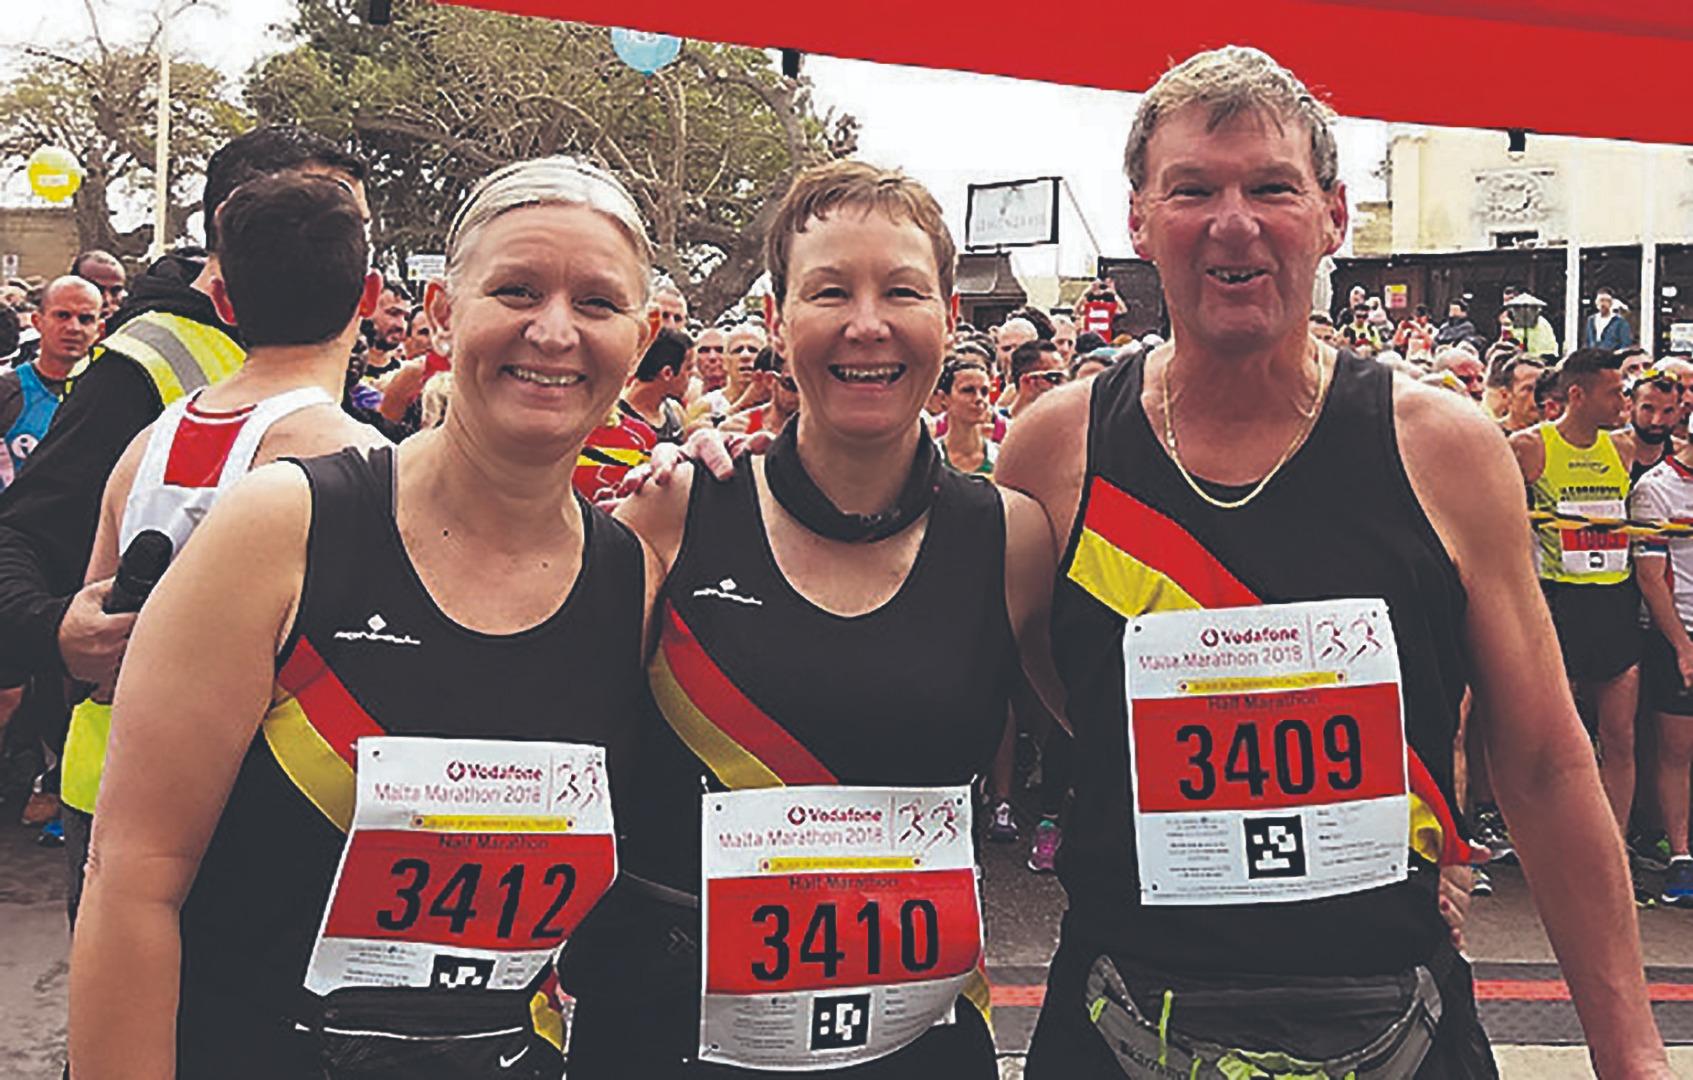 Couple's marathon effort